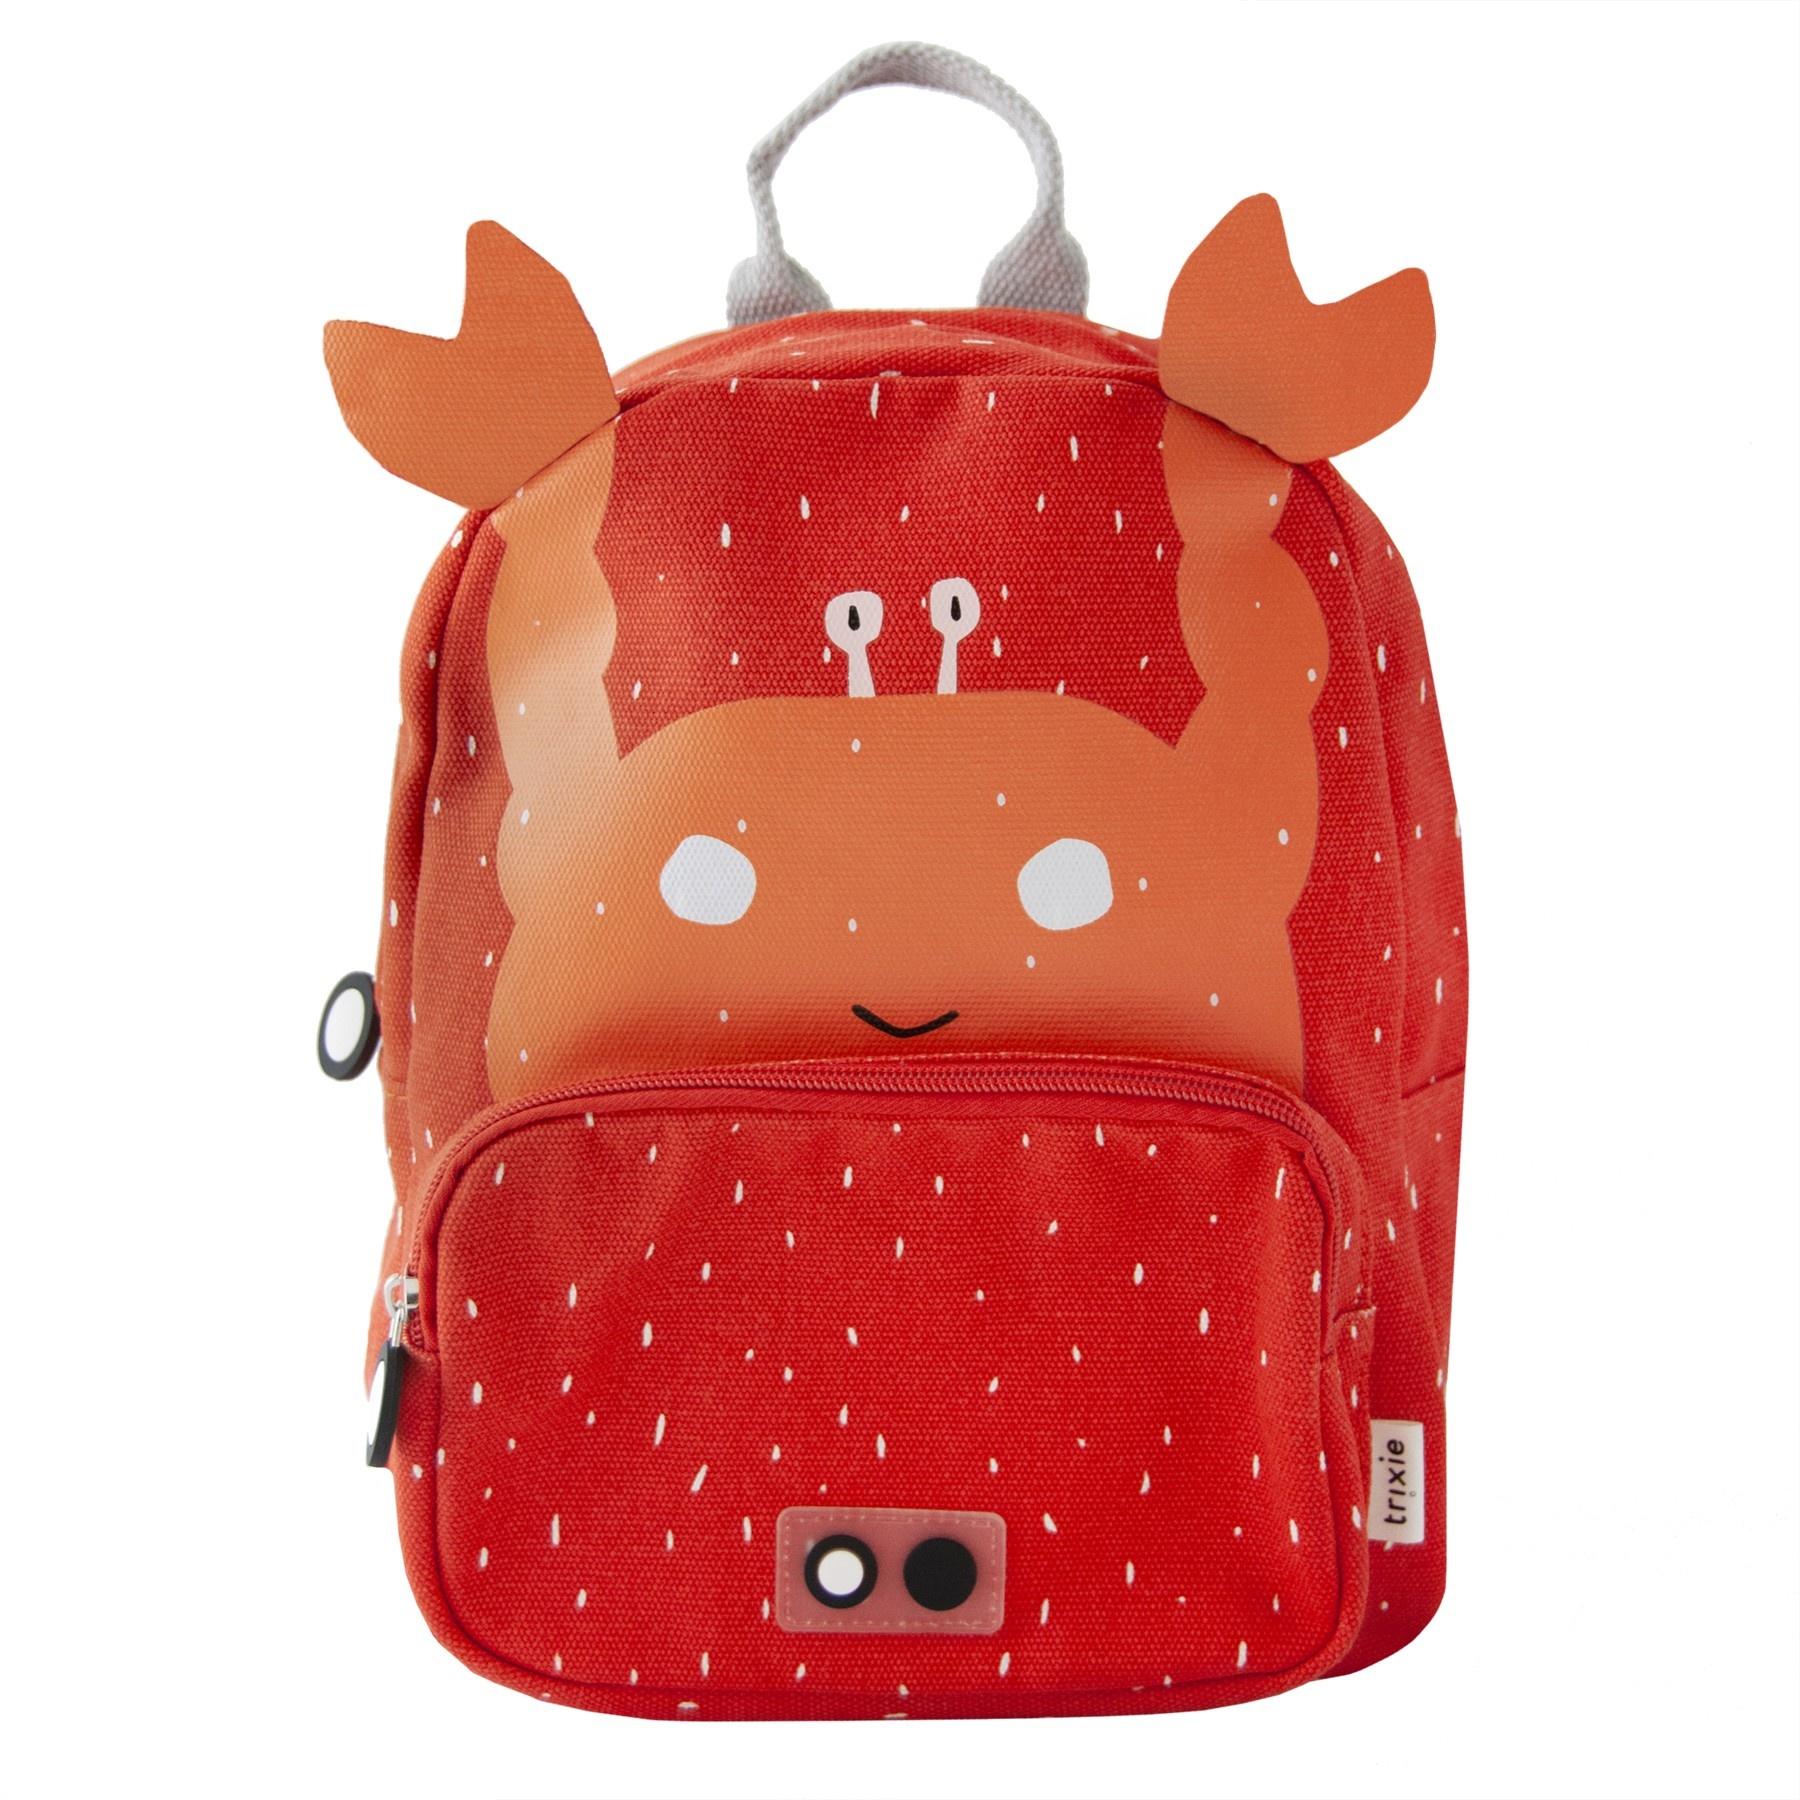 86b02ffbe2c Trixie Backpack Mrs. Crab - Fanthome.com